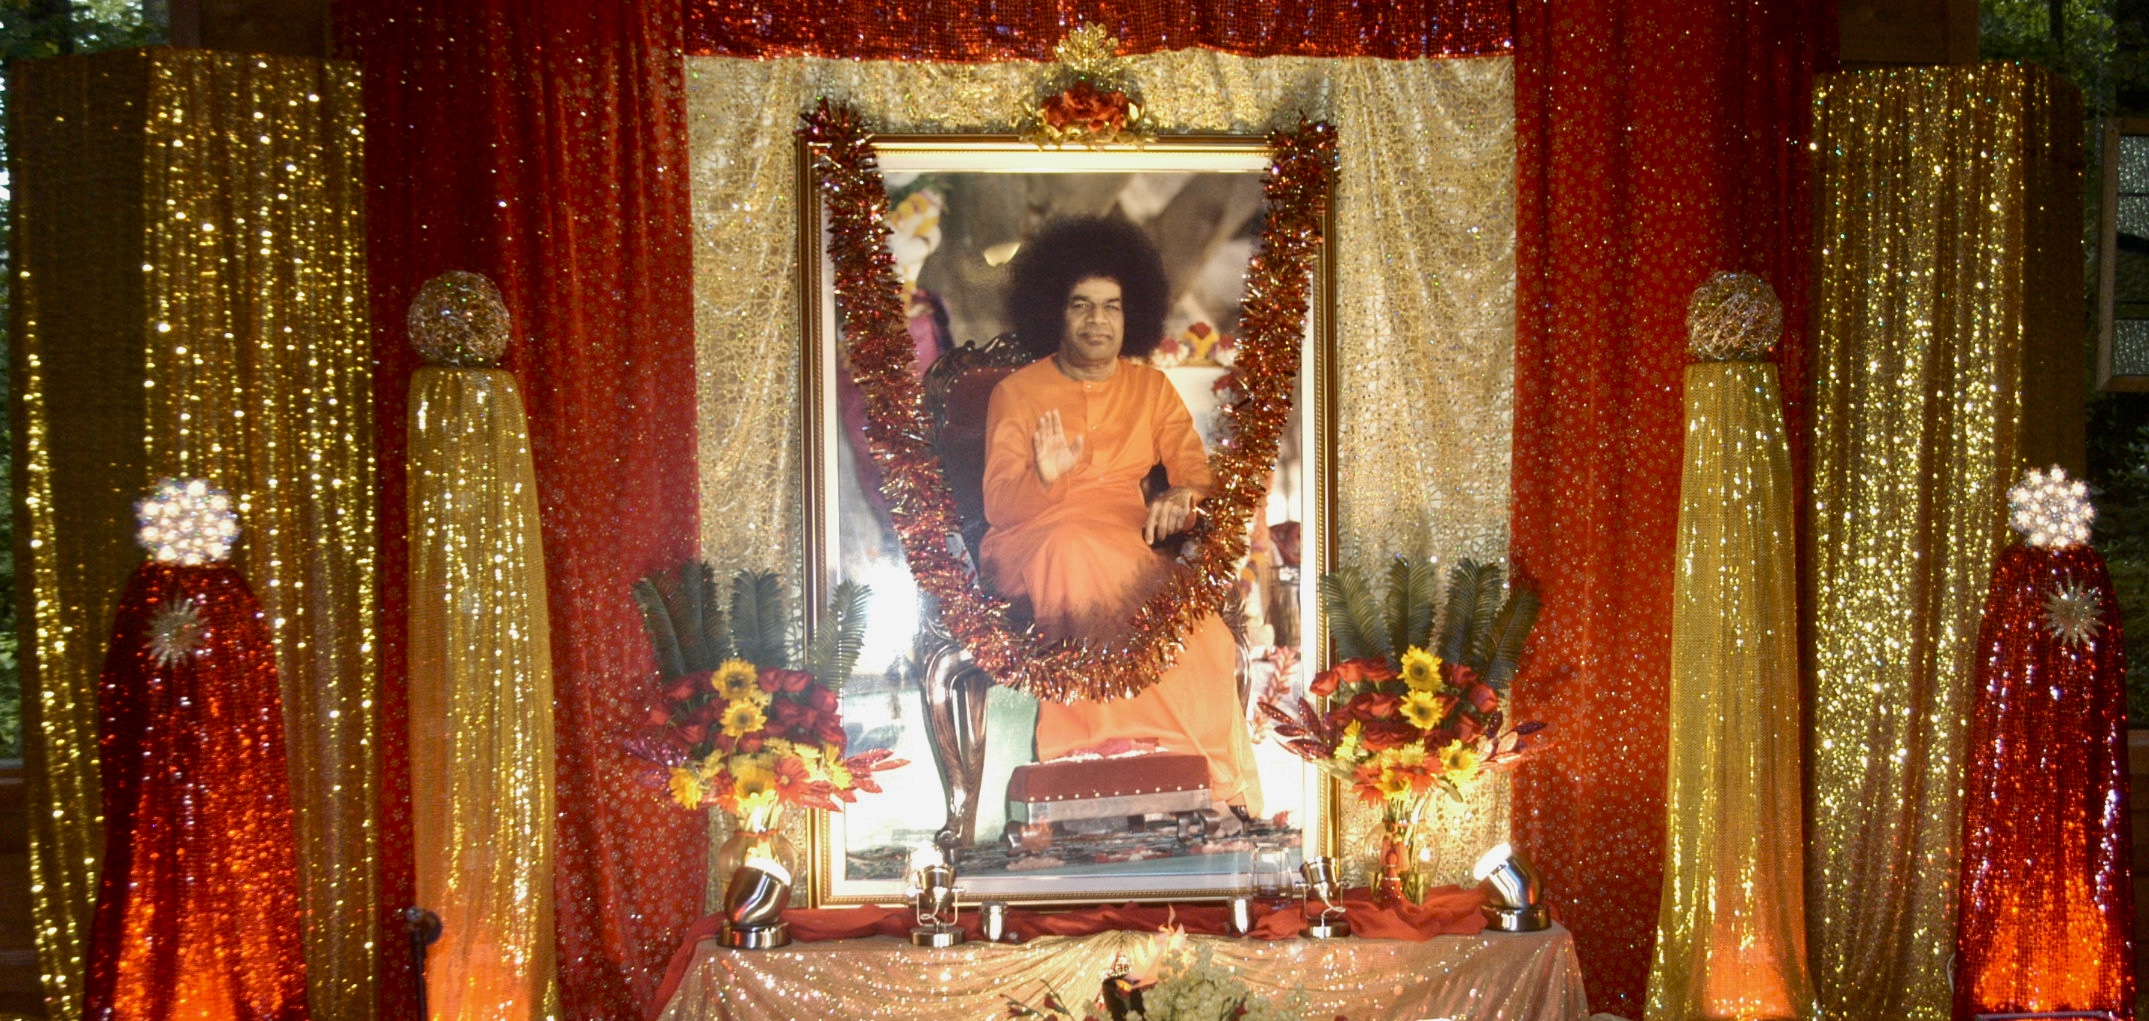 Sathya Sai Baba Center of Atlanta